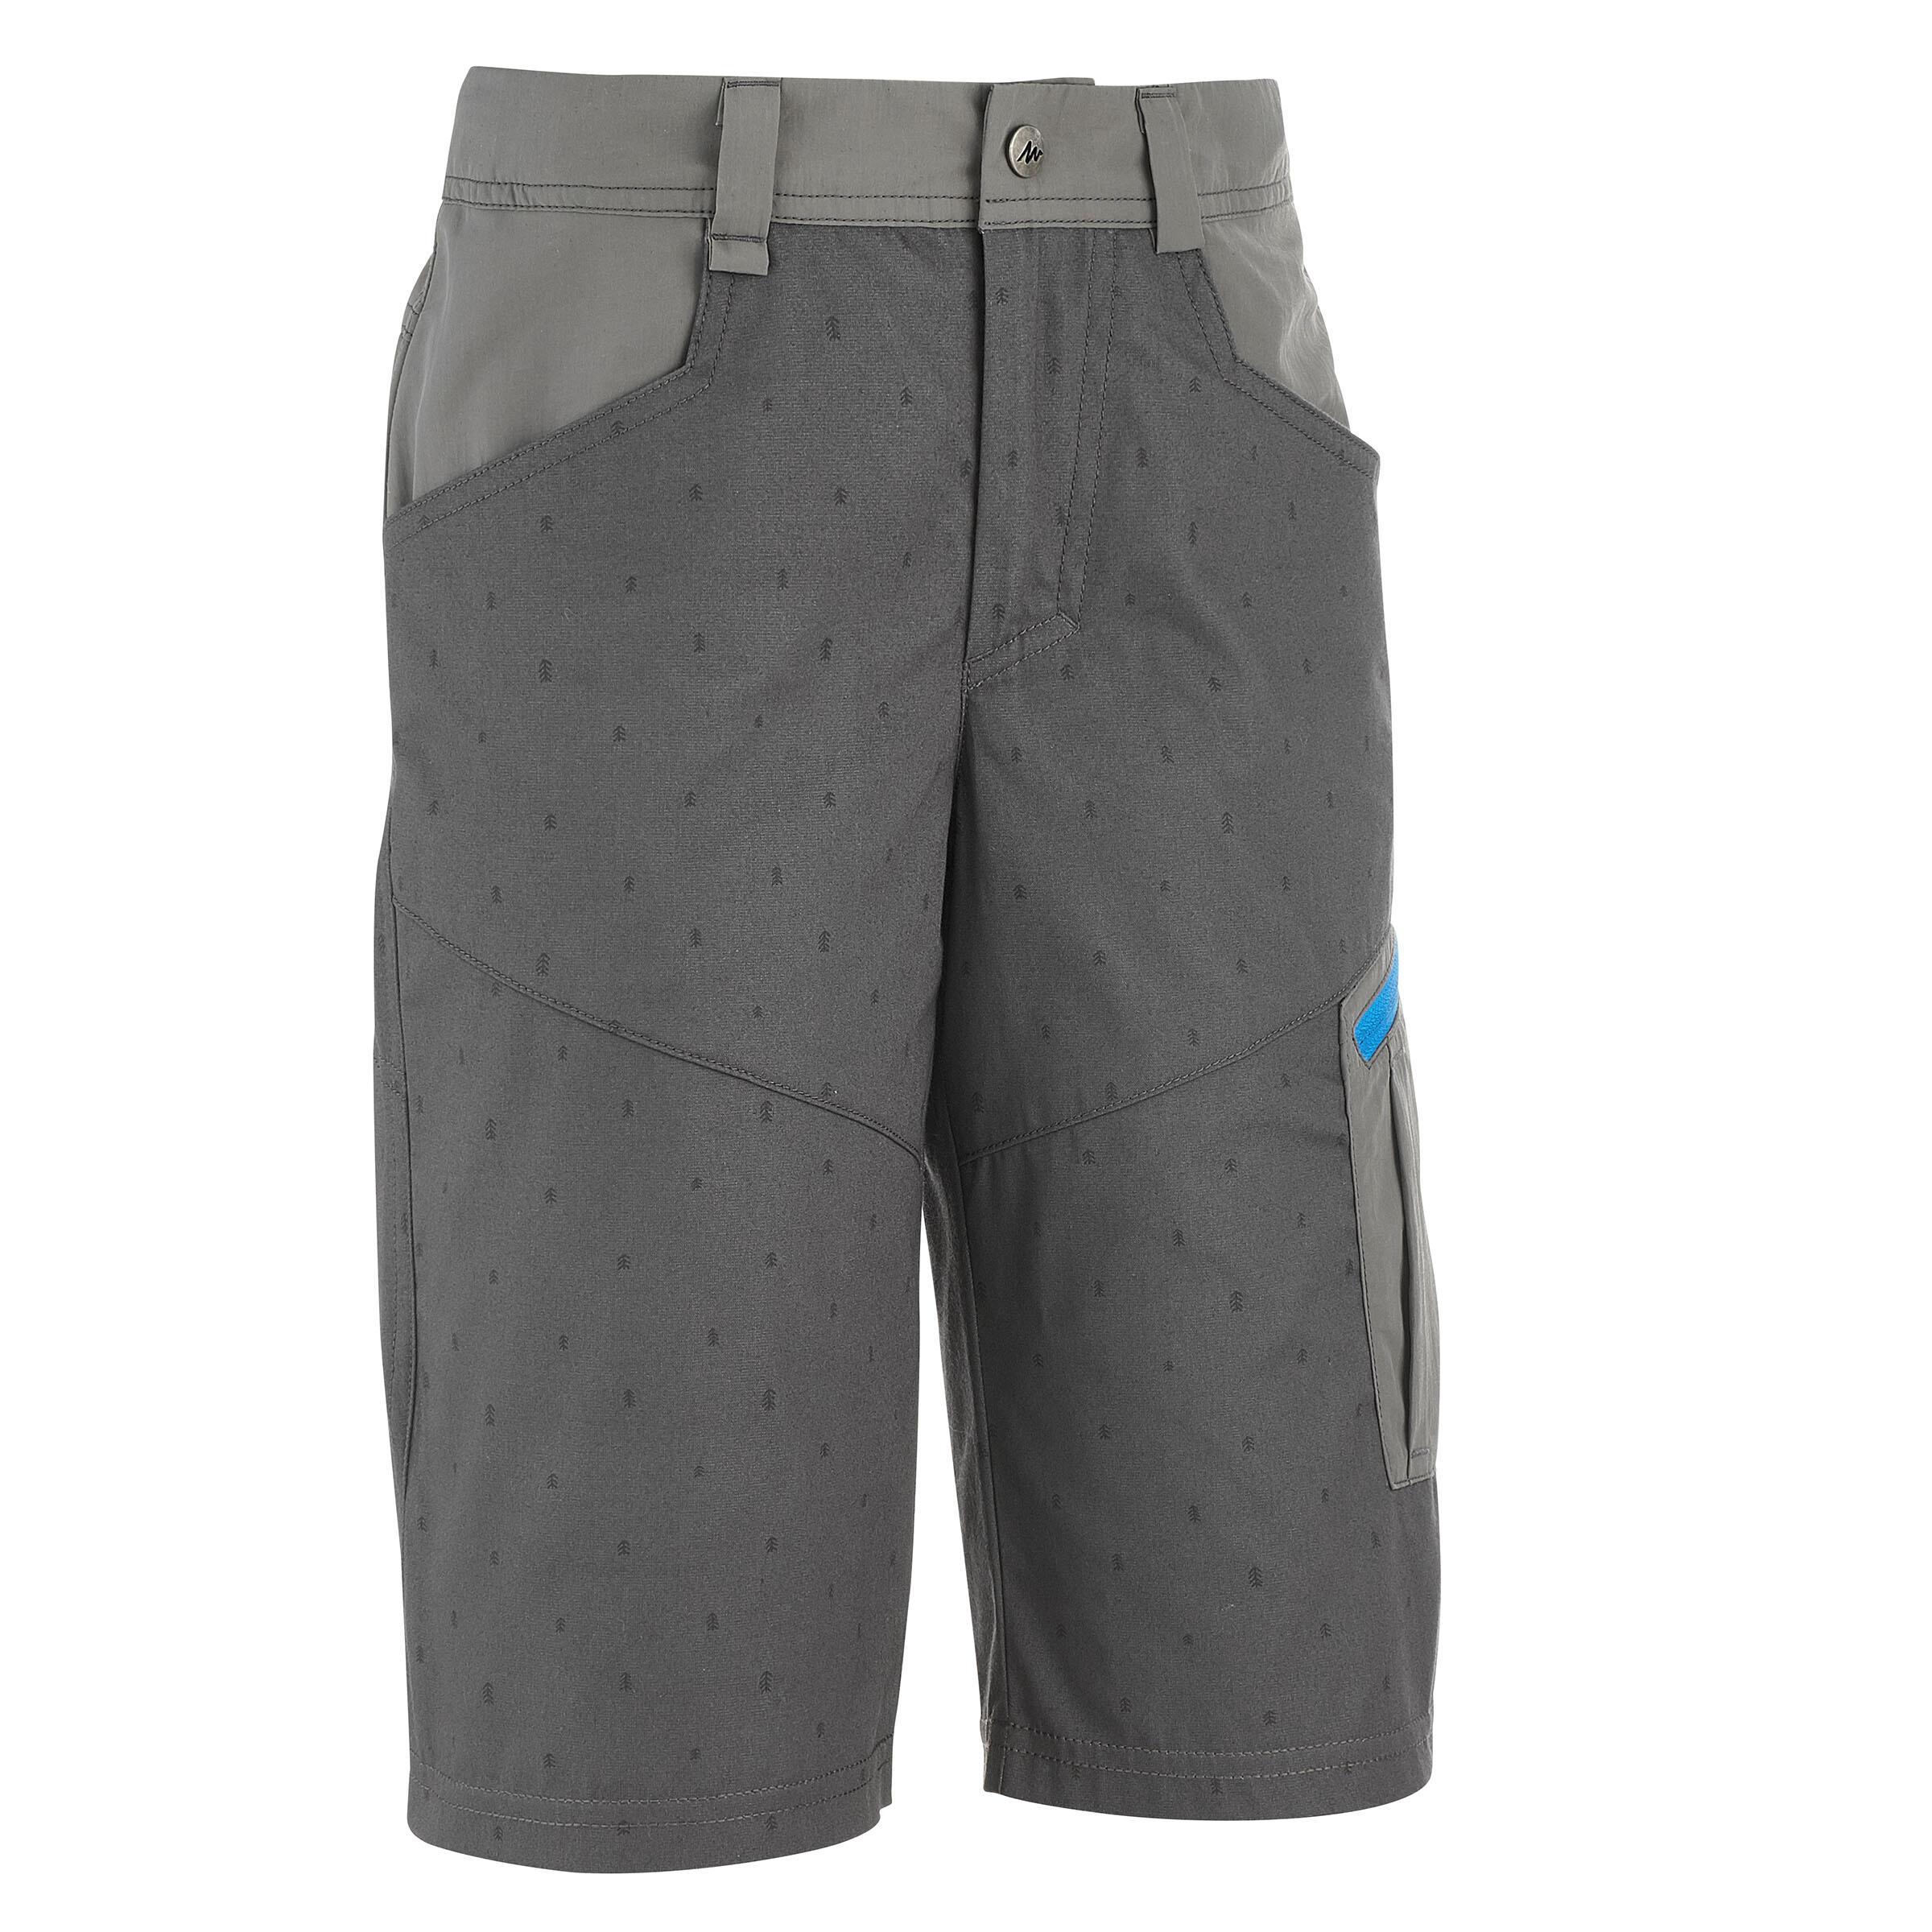 Kid's Hiking Shorts Hike 500 - Grey